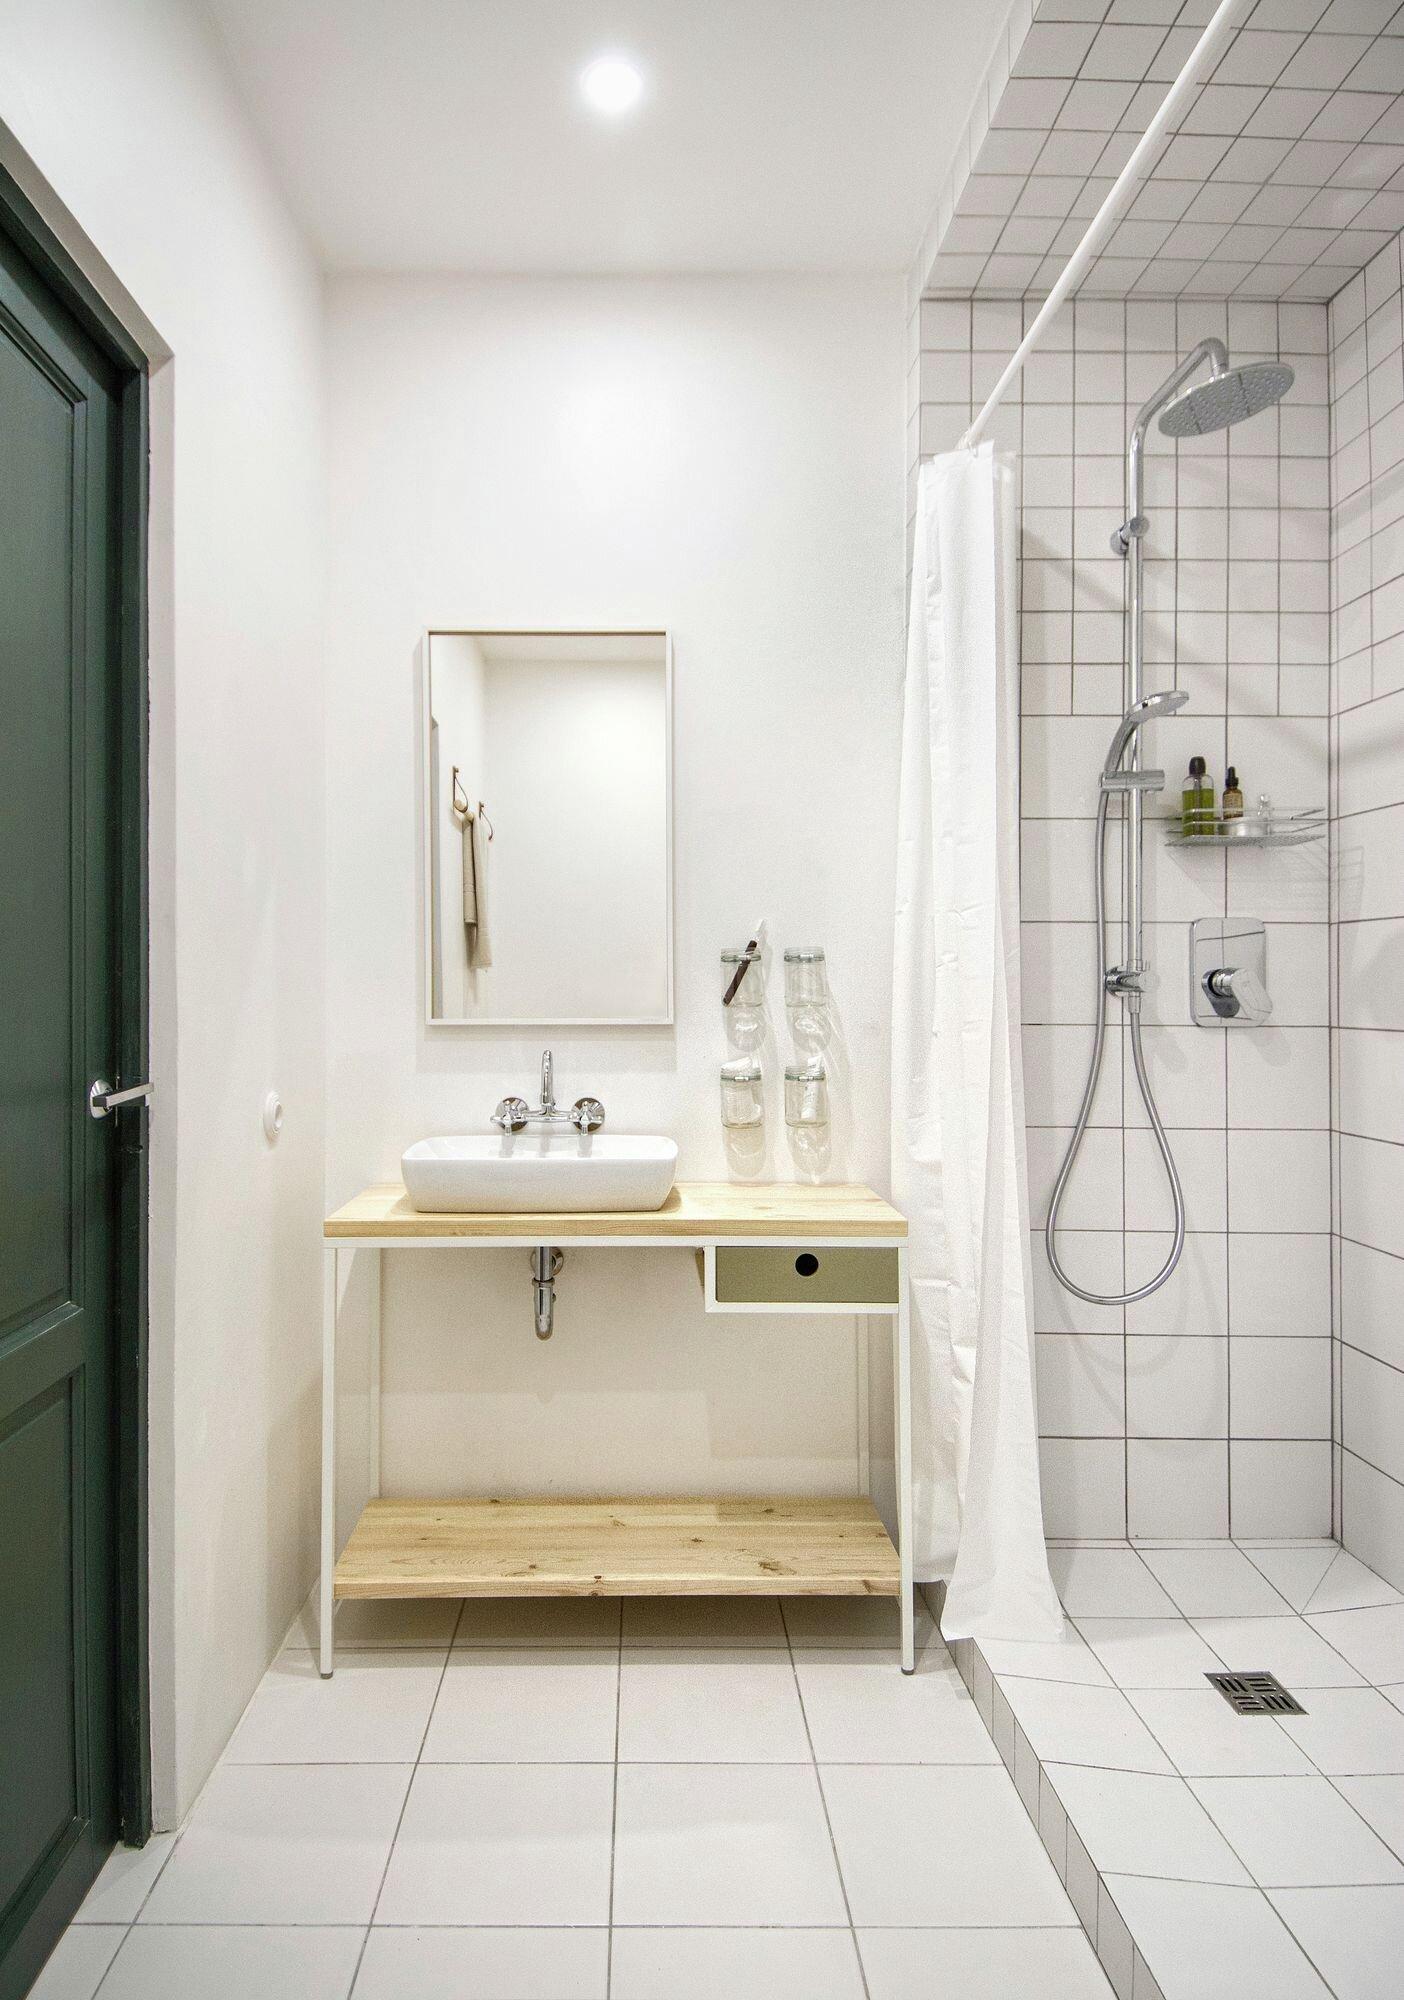 Small Apartment - Interior AK - INT2architecture - Russua - Bathroom - Humble Homes